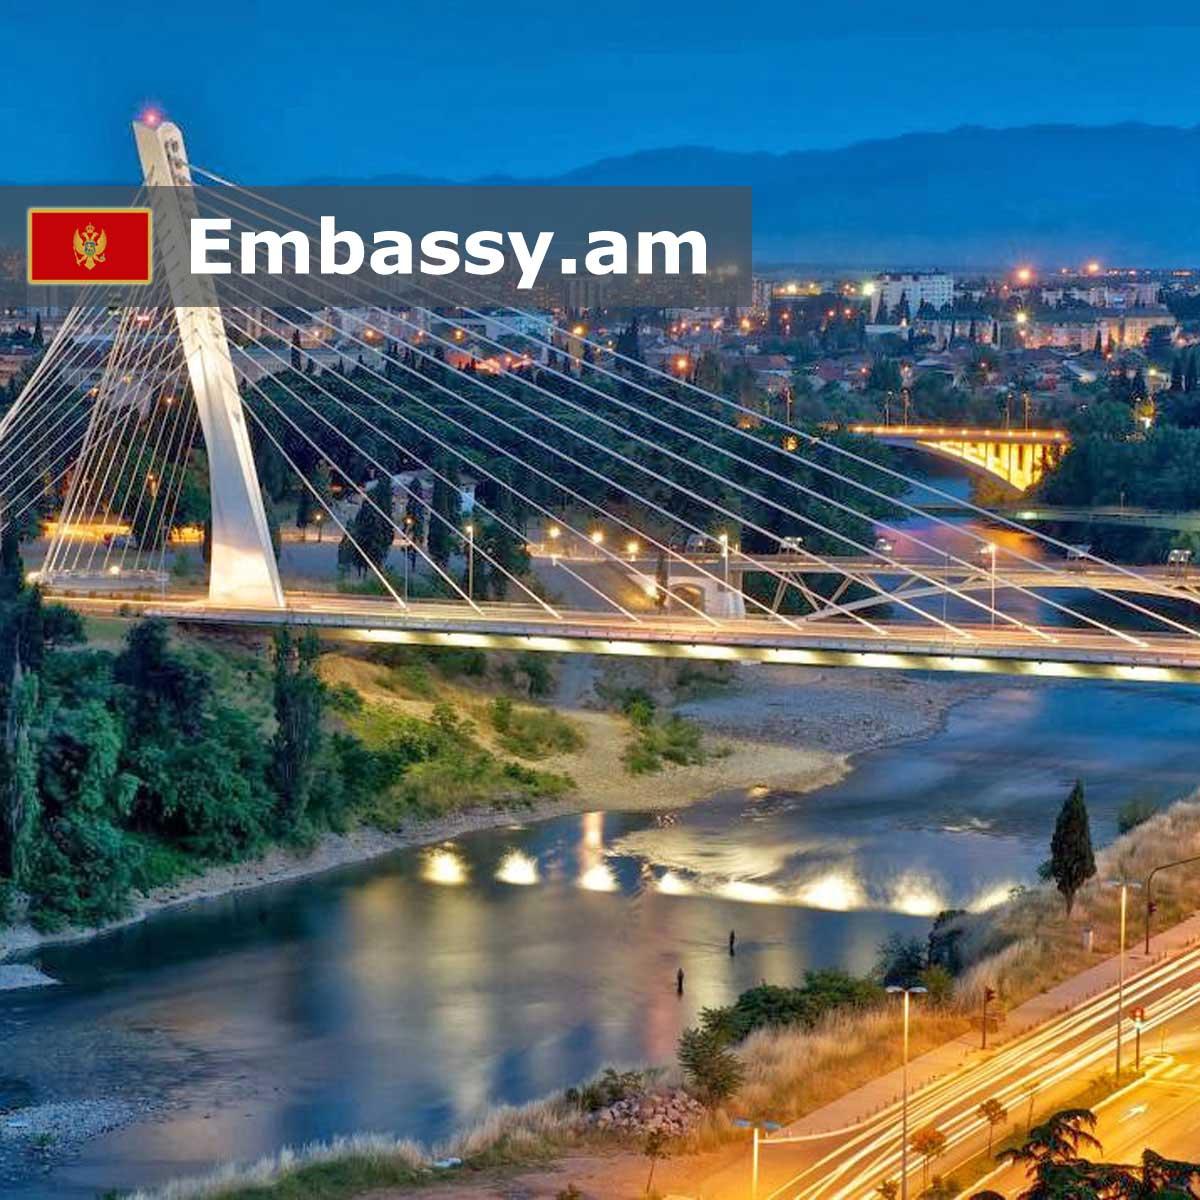 Podgorica - Hotels in Montenegro - Embassy.am